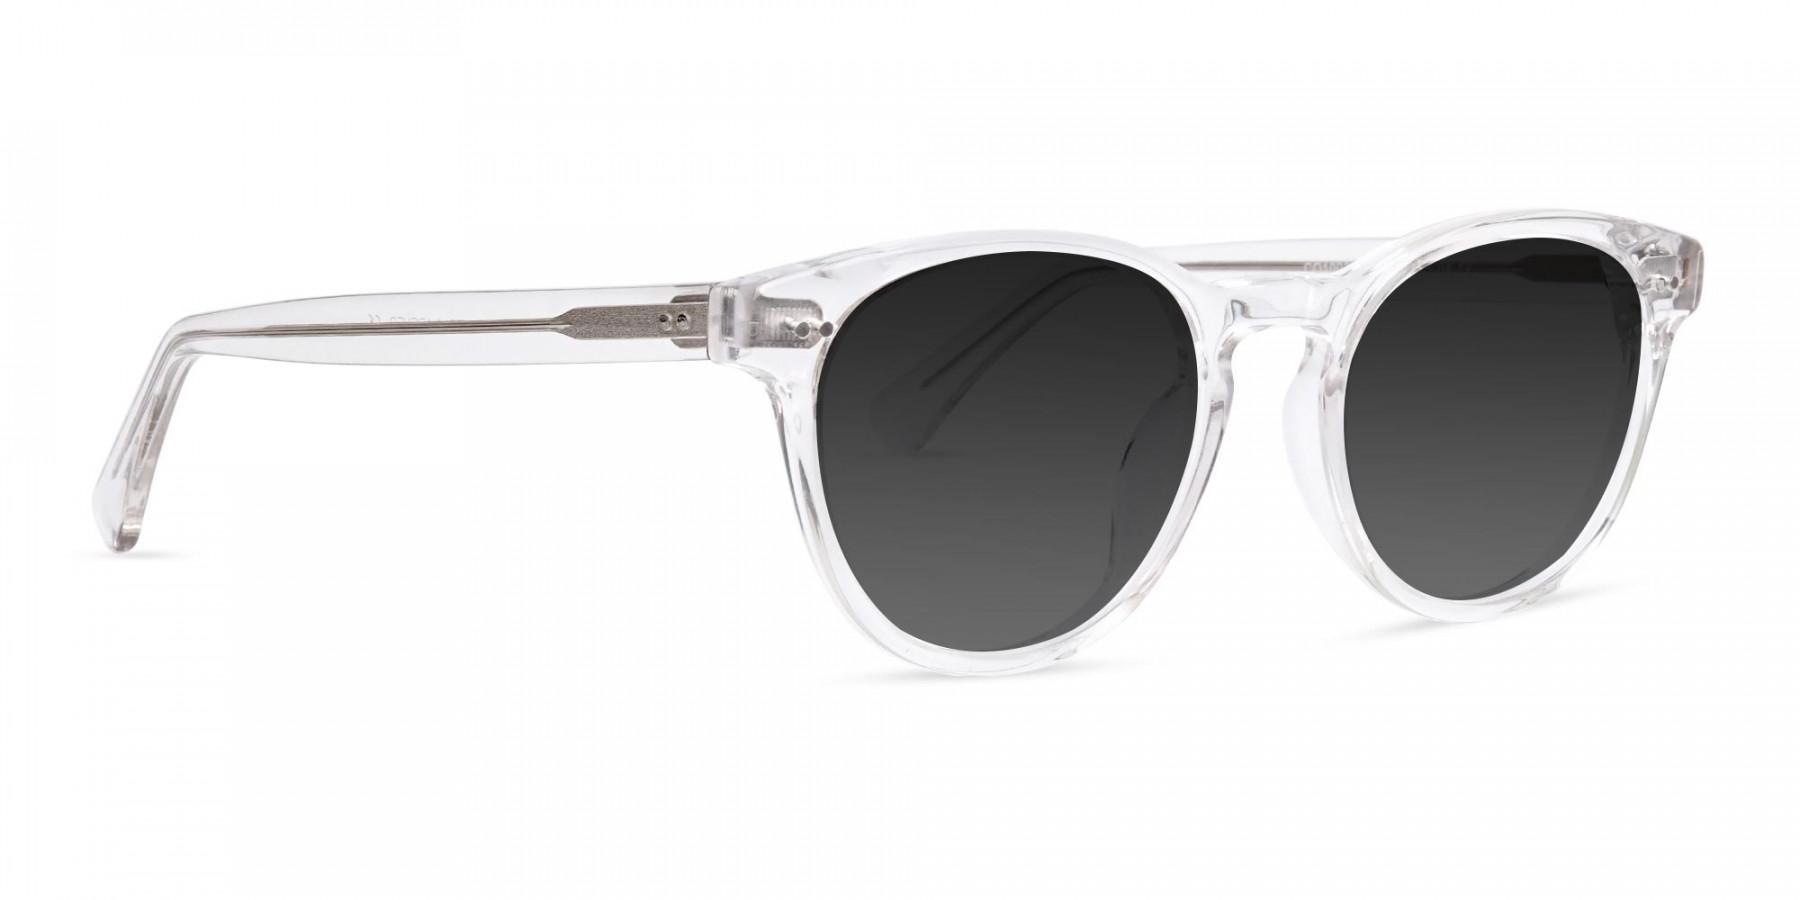 transparent-round-full-rim-dark-grey-tinted-sunglasses-frames-3